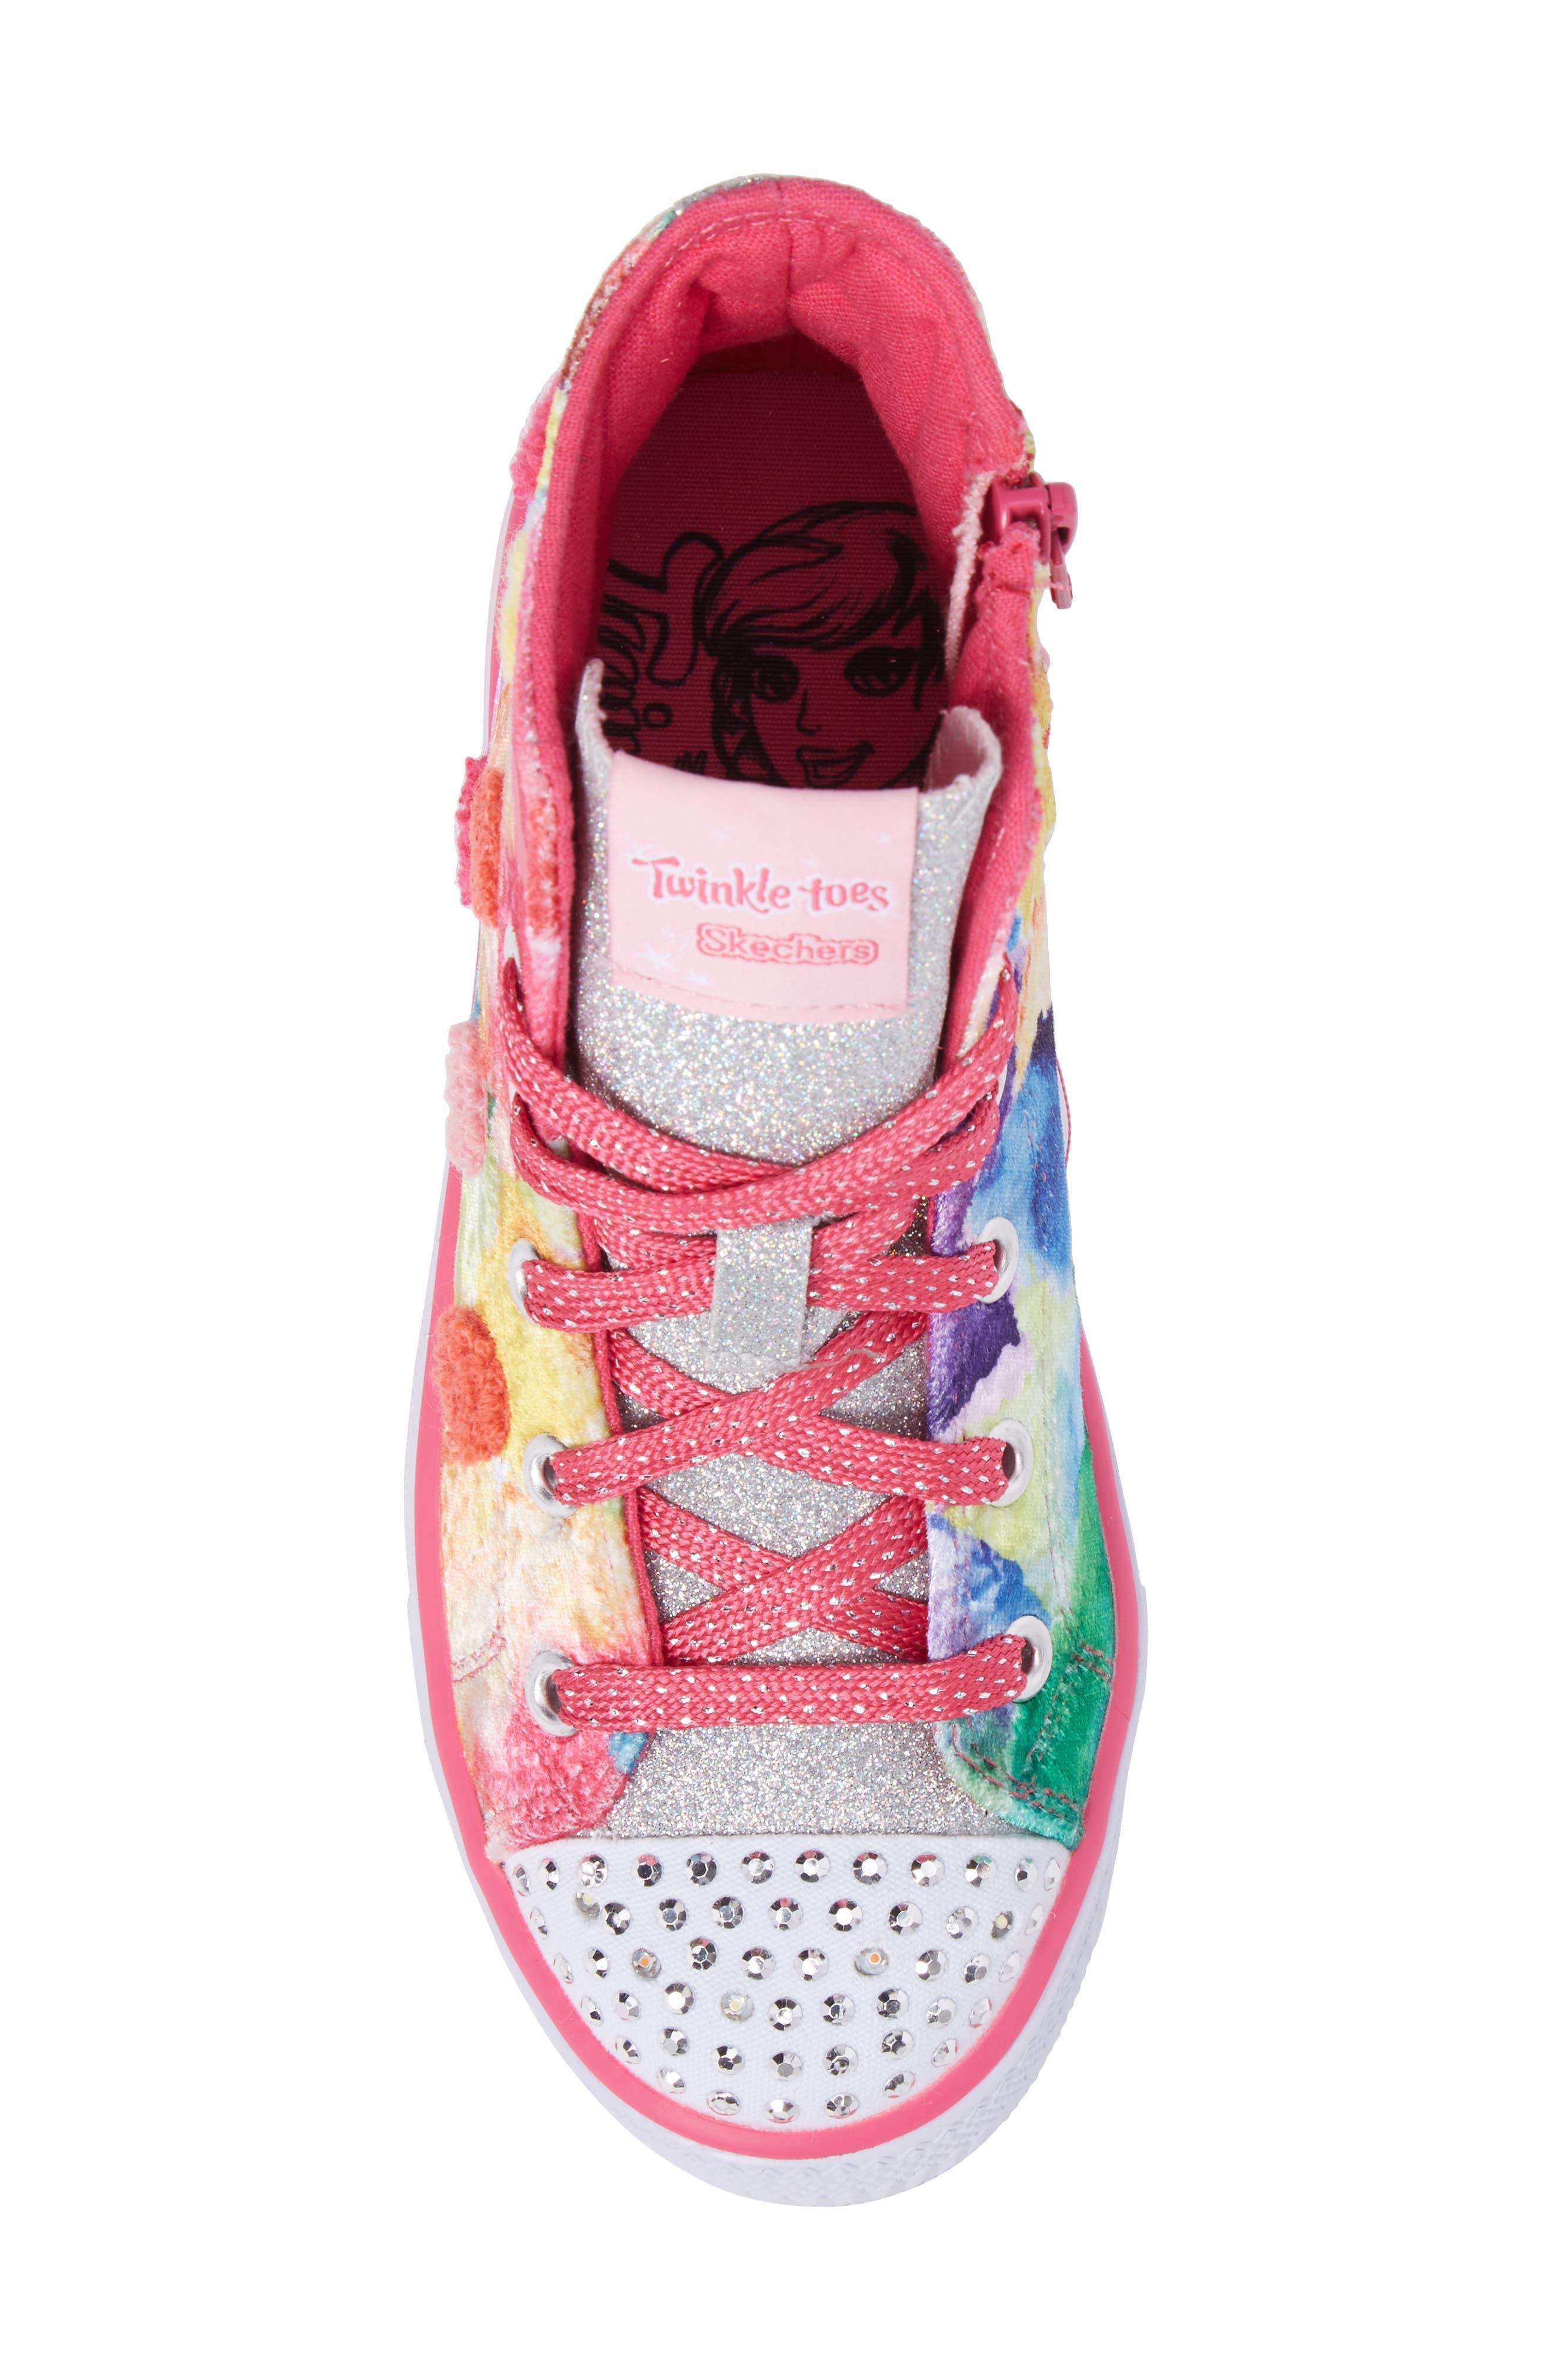 SKECHERS,                             Twinkle Toes Shuffles Light-Up High Top Sneaker,                             Alternate thumbnail 5, color,                             650